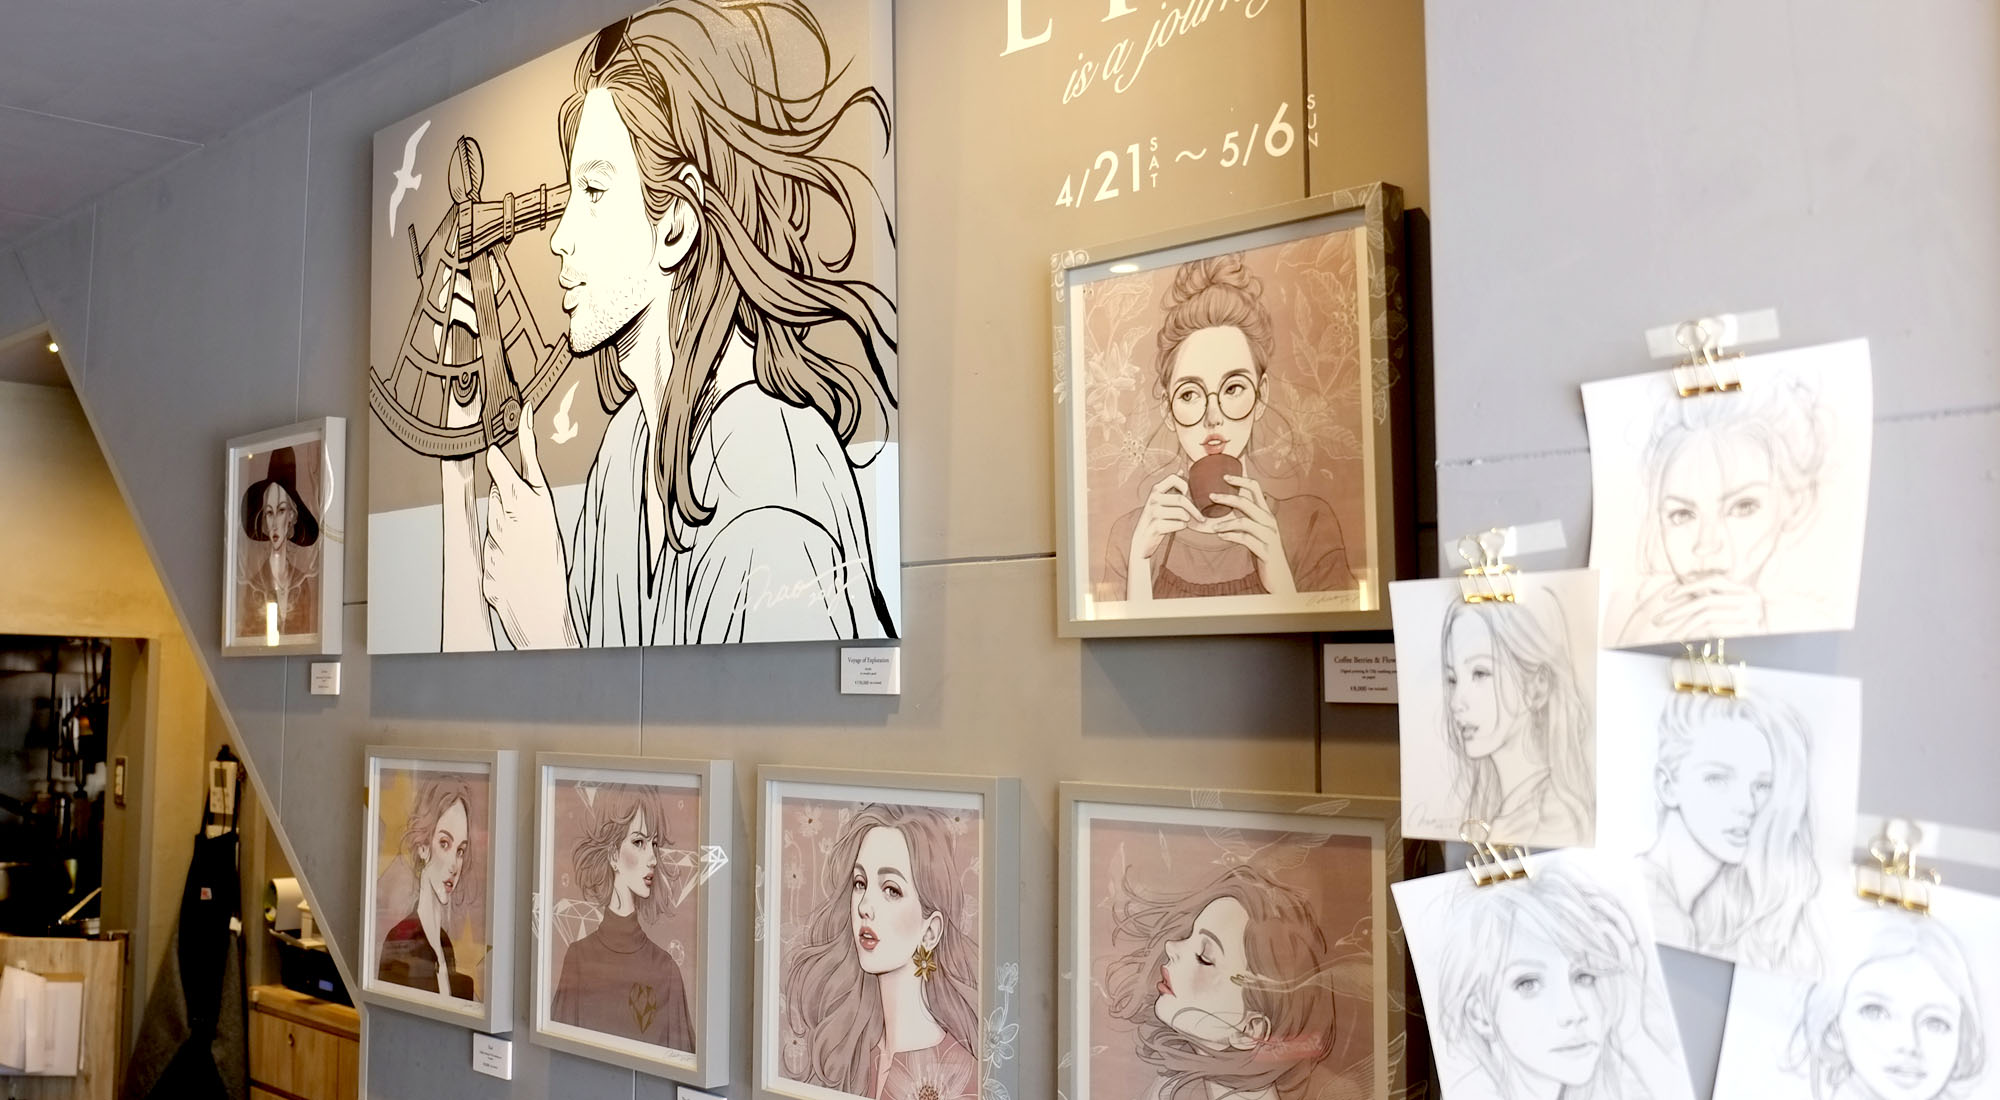 illust & design napsac  |  福岡のイラスト&デザイン制作所